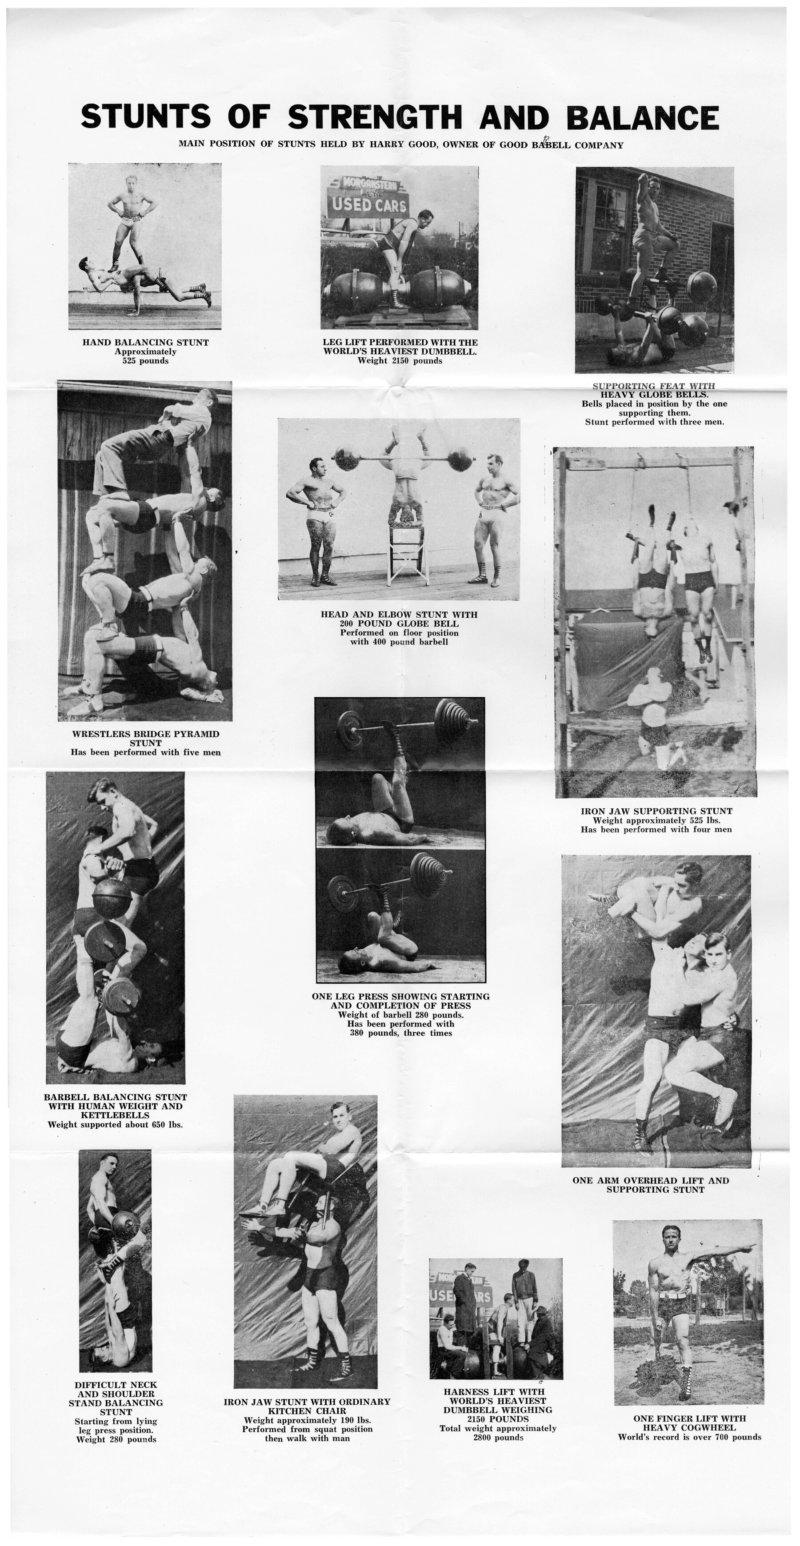 Stunts of Strength and Balance